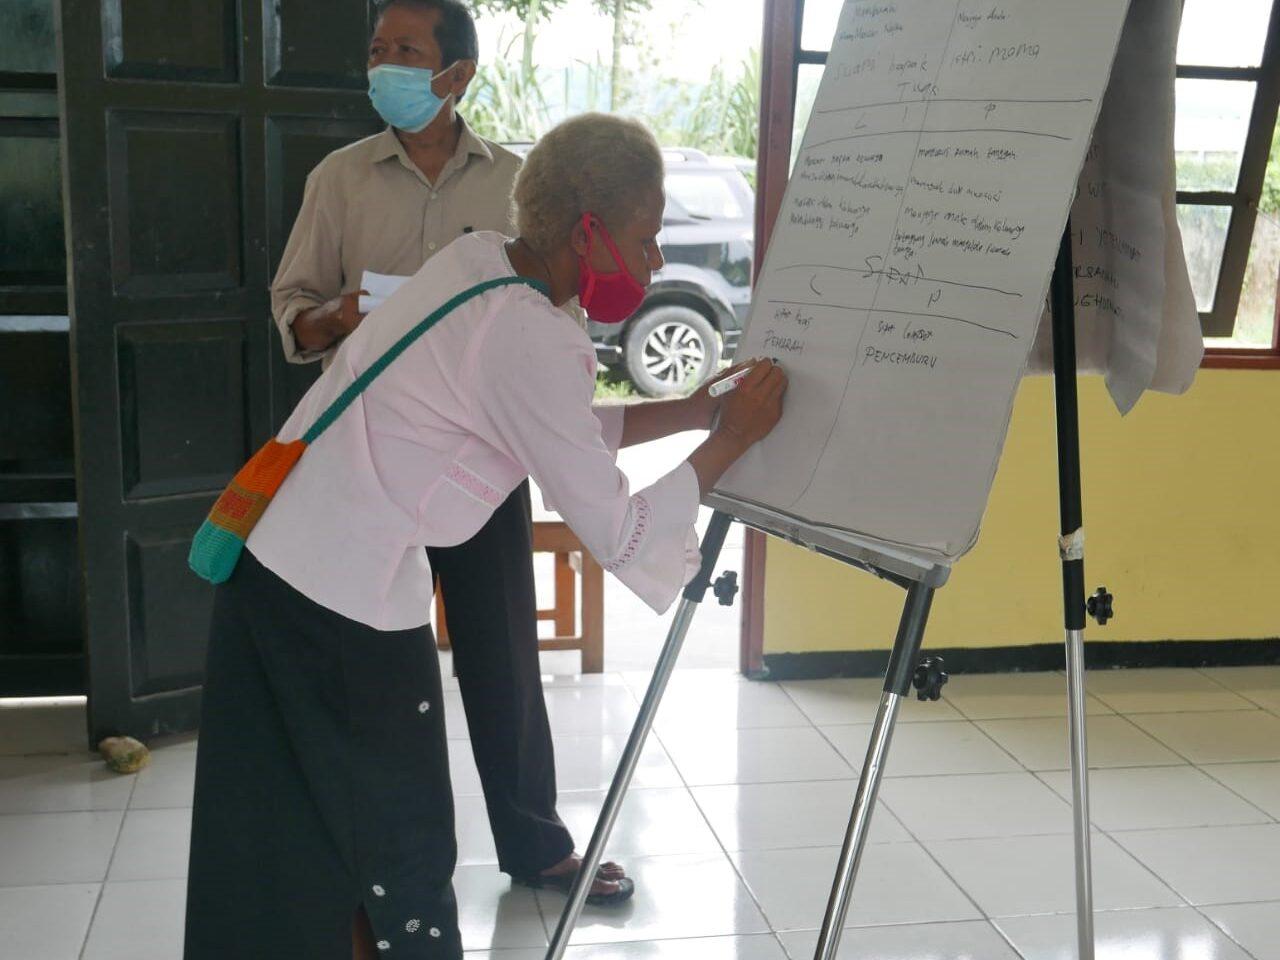 Meeting about gender-based violence by Pujaprema